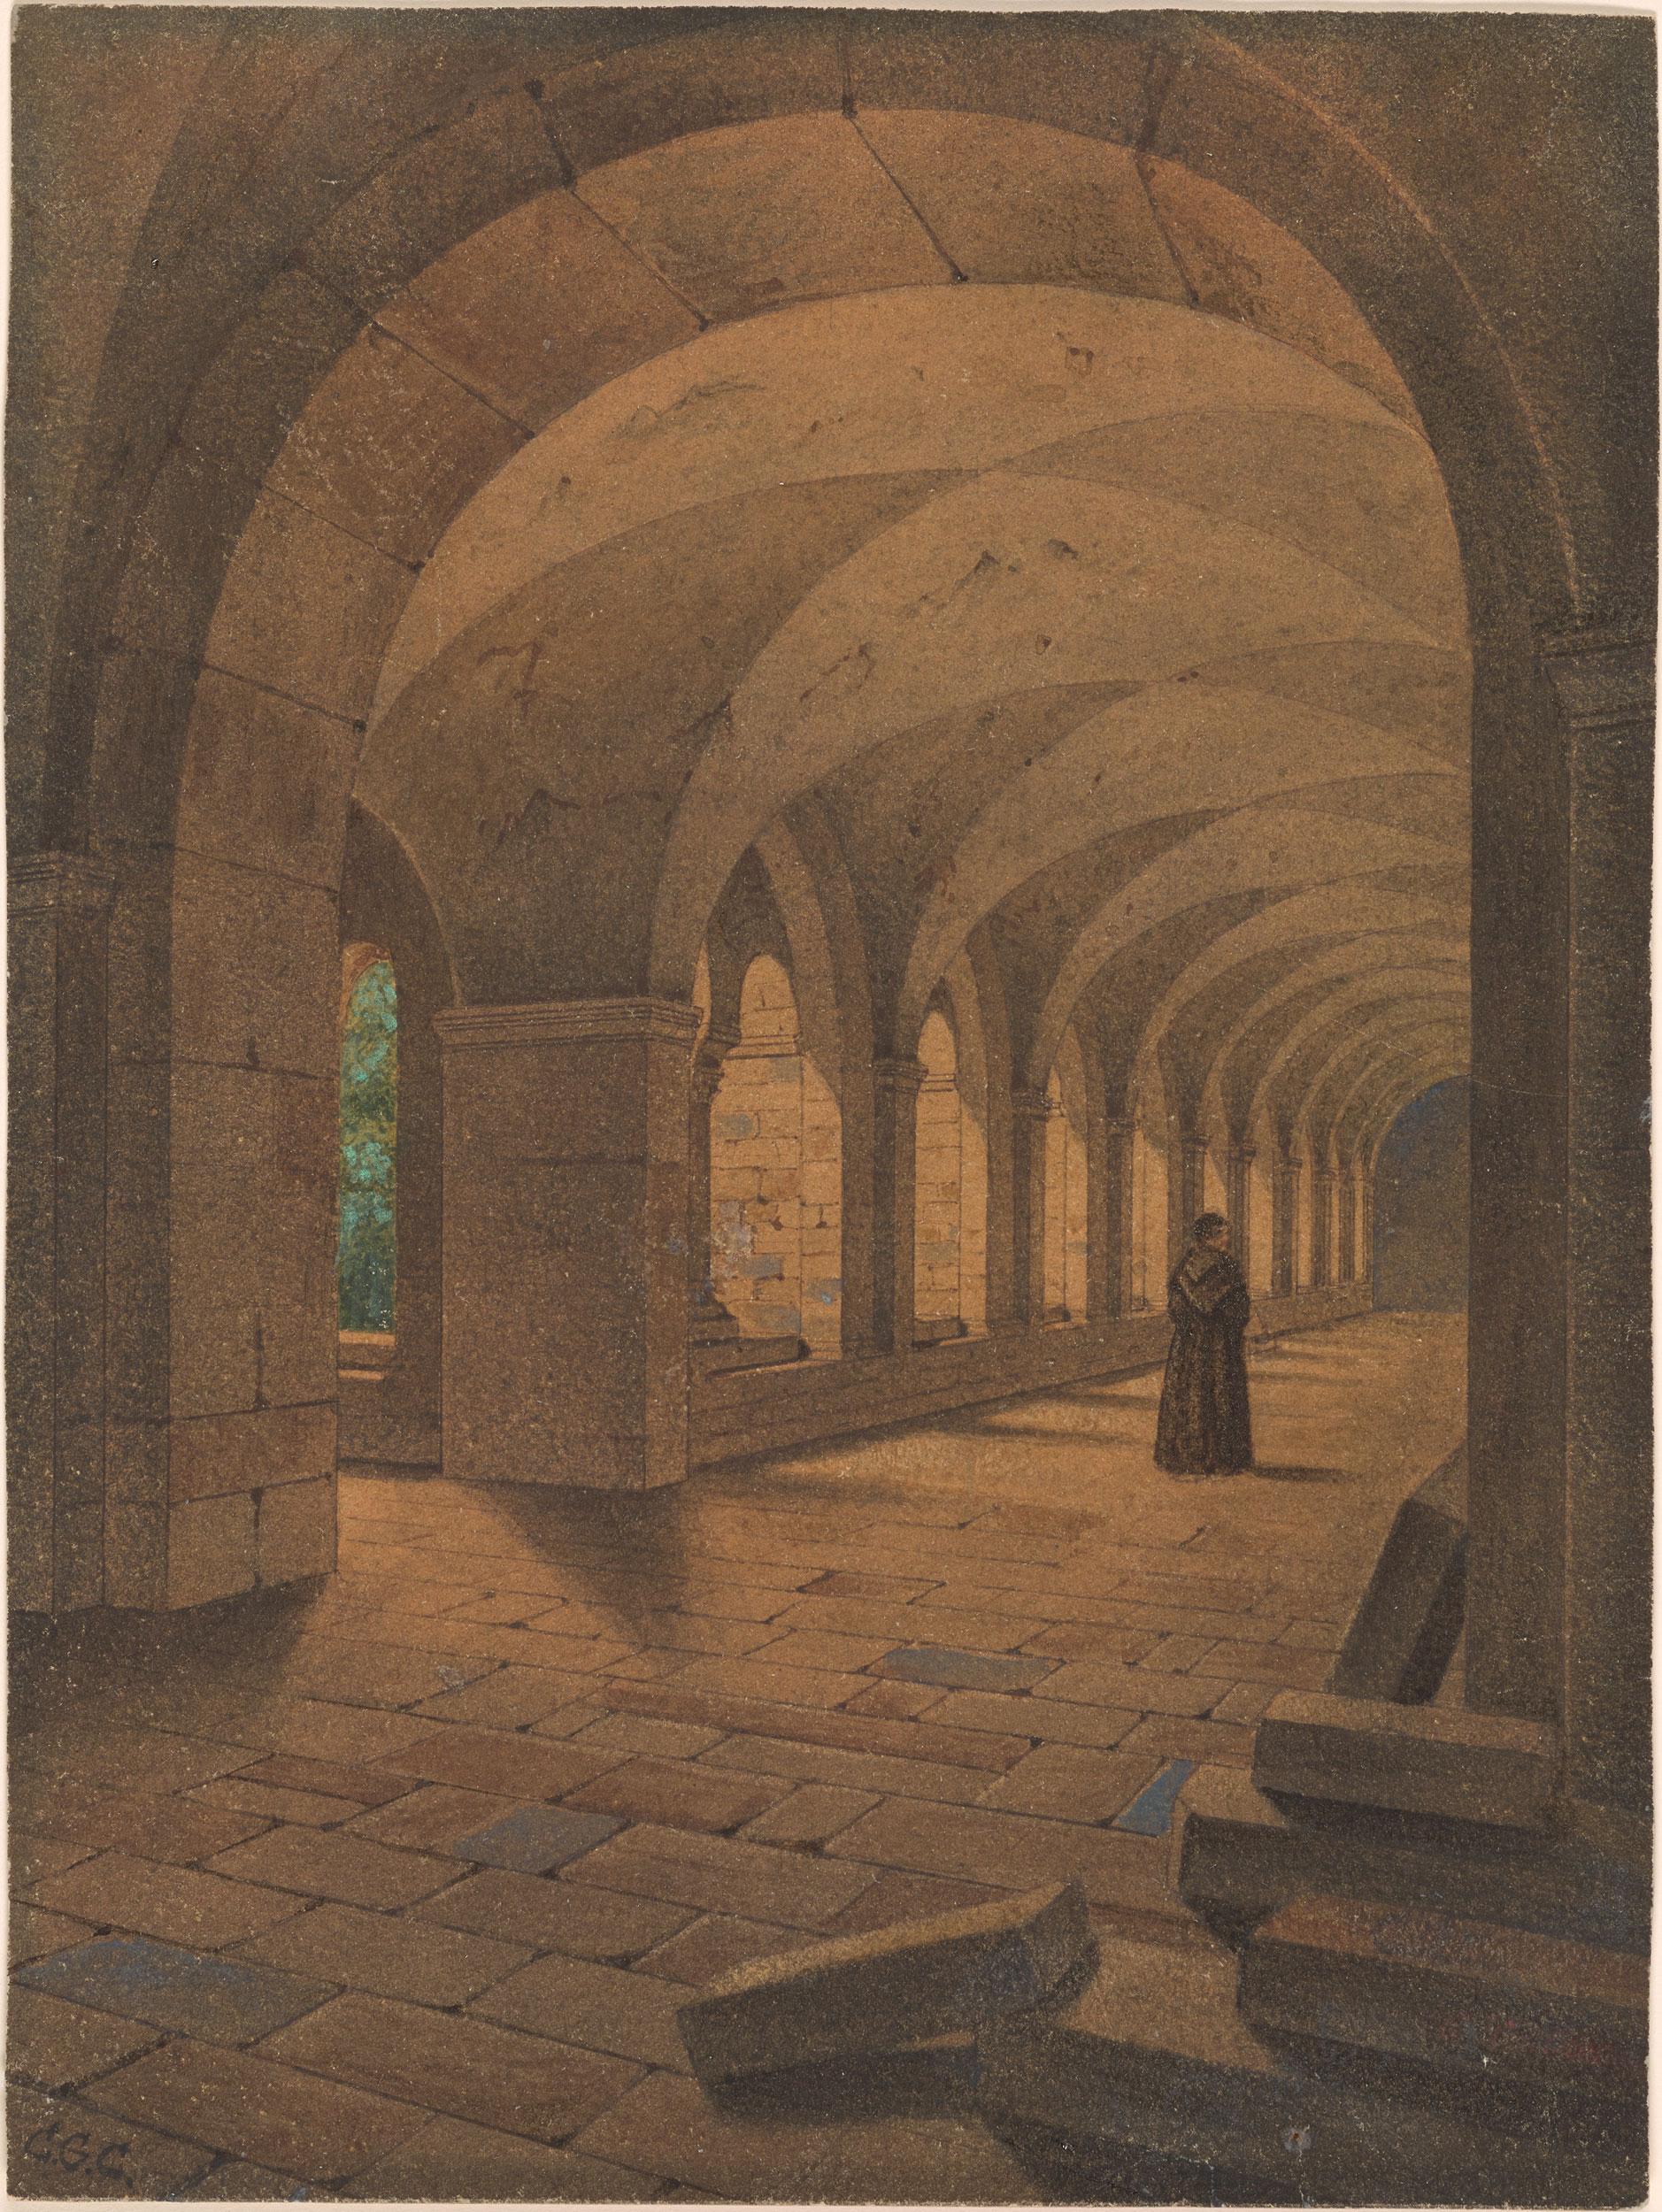 Carl Gustav Carus Roman Cloister Drawings Online The